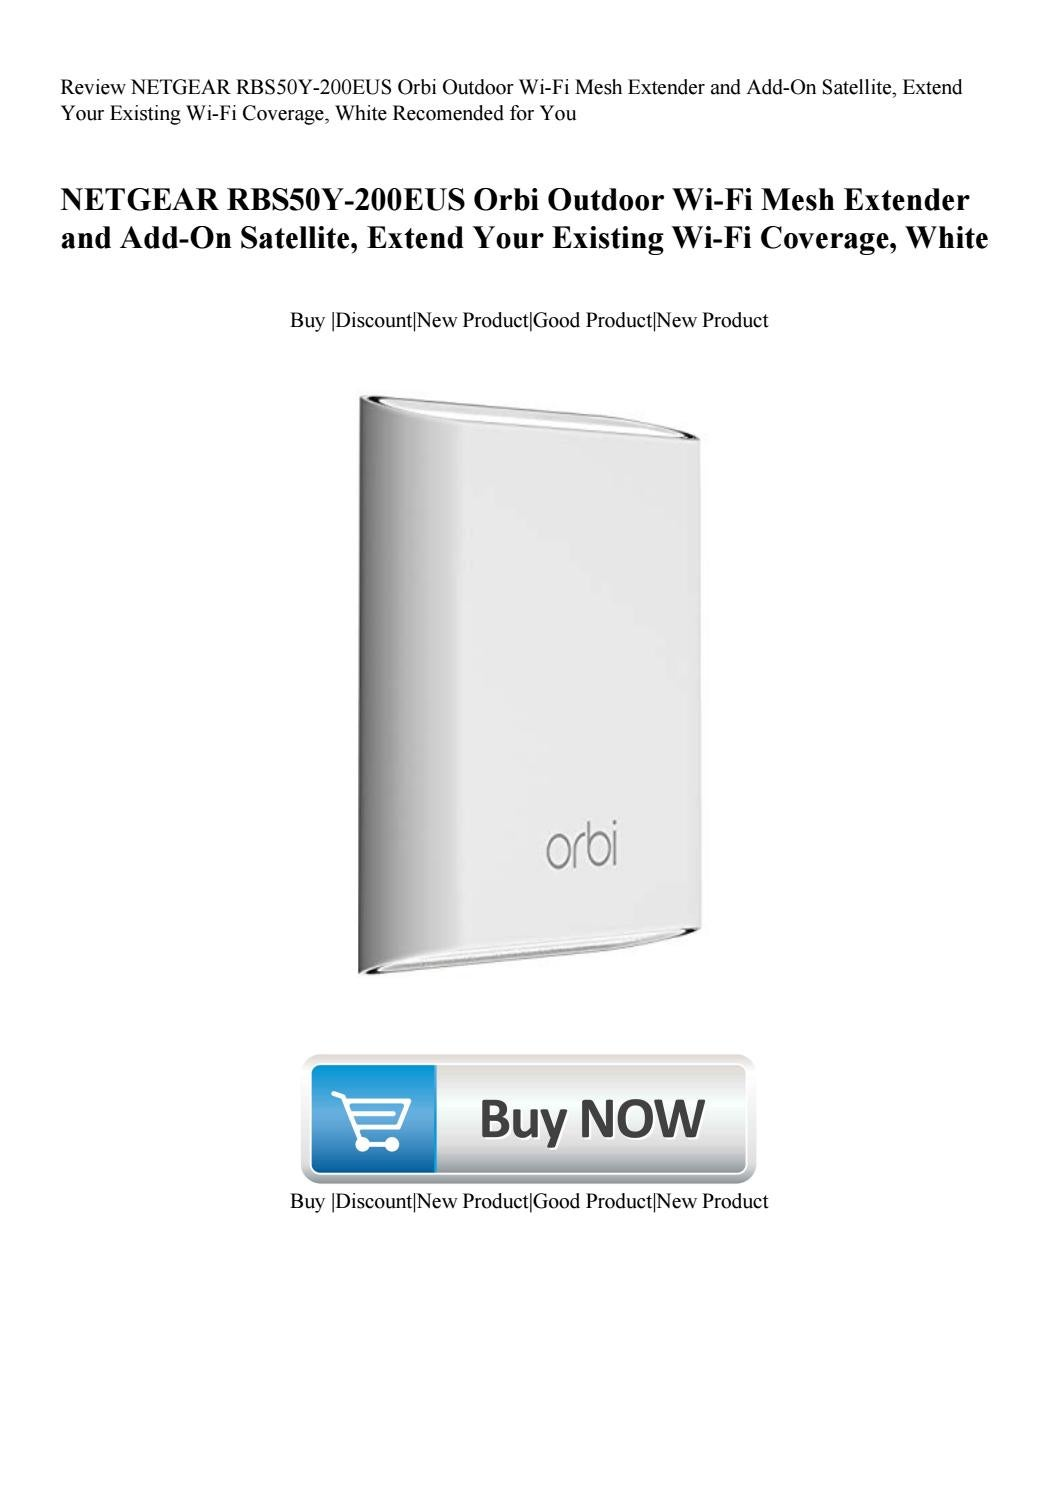 Review NETGEAR RBS50Y-200EUS Orbi Outdoor Wi-Fi Mesh